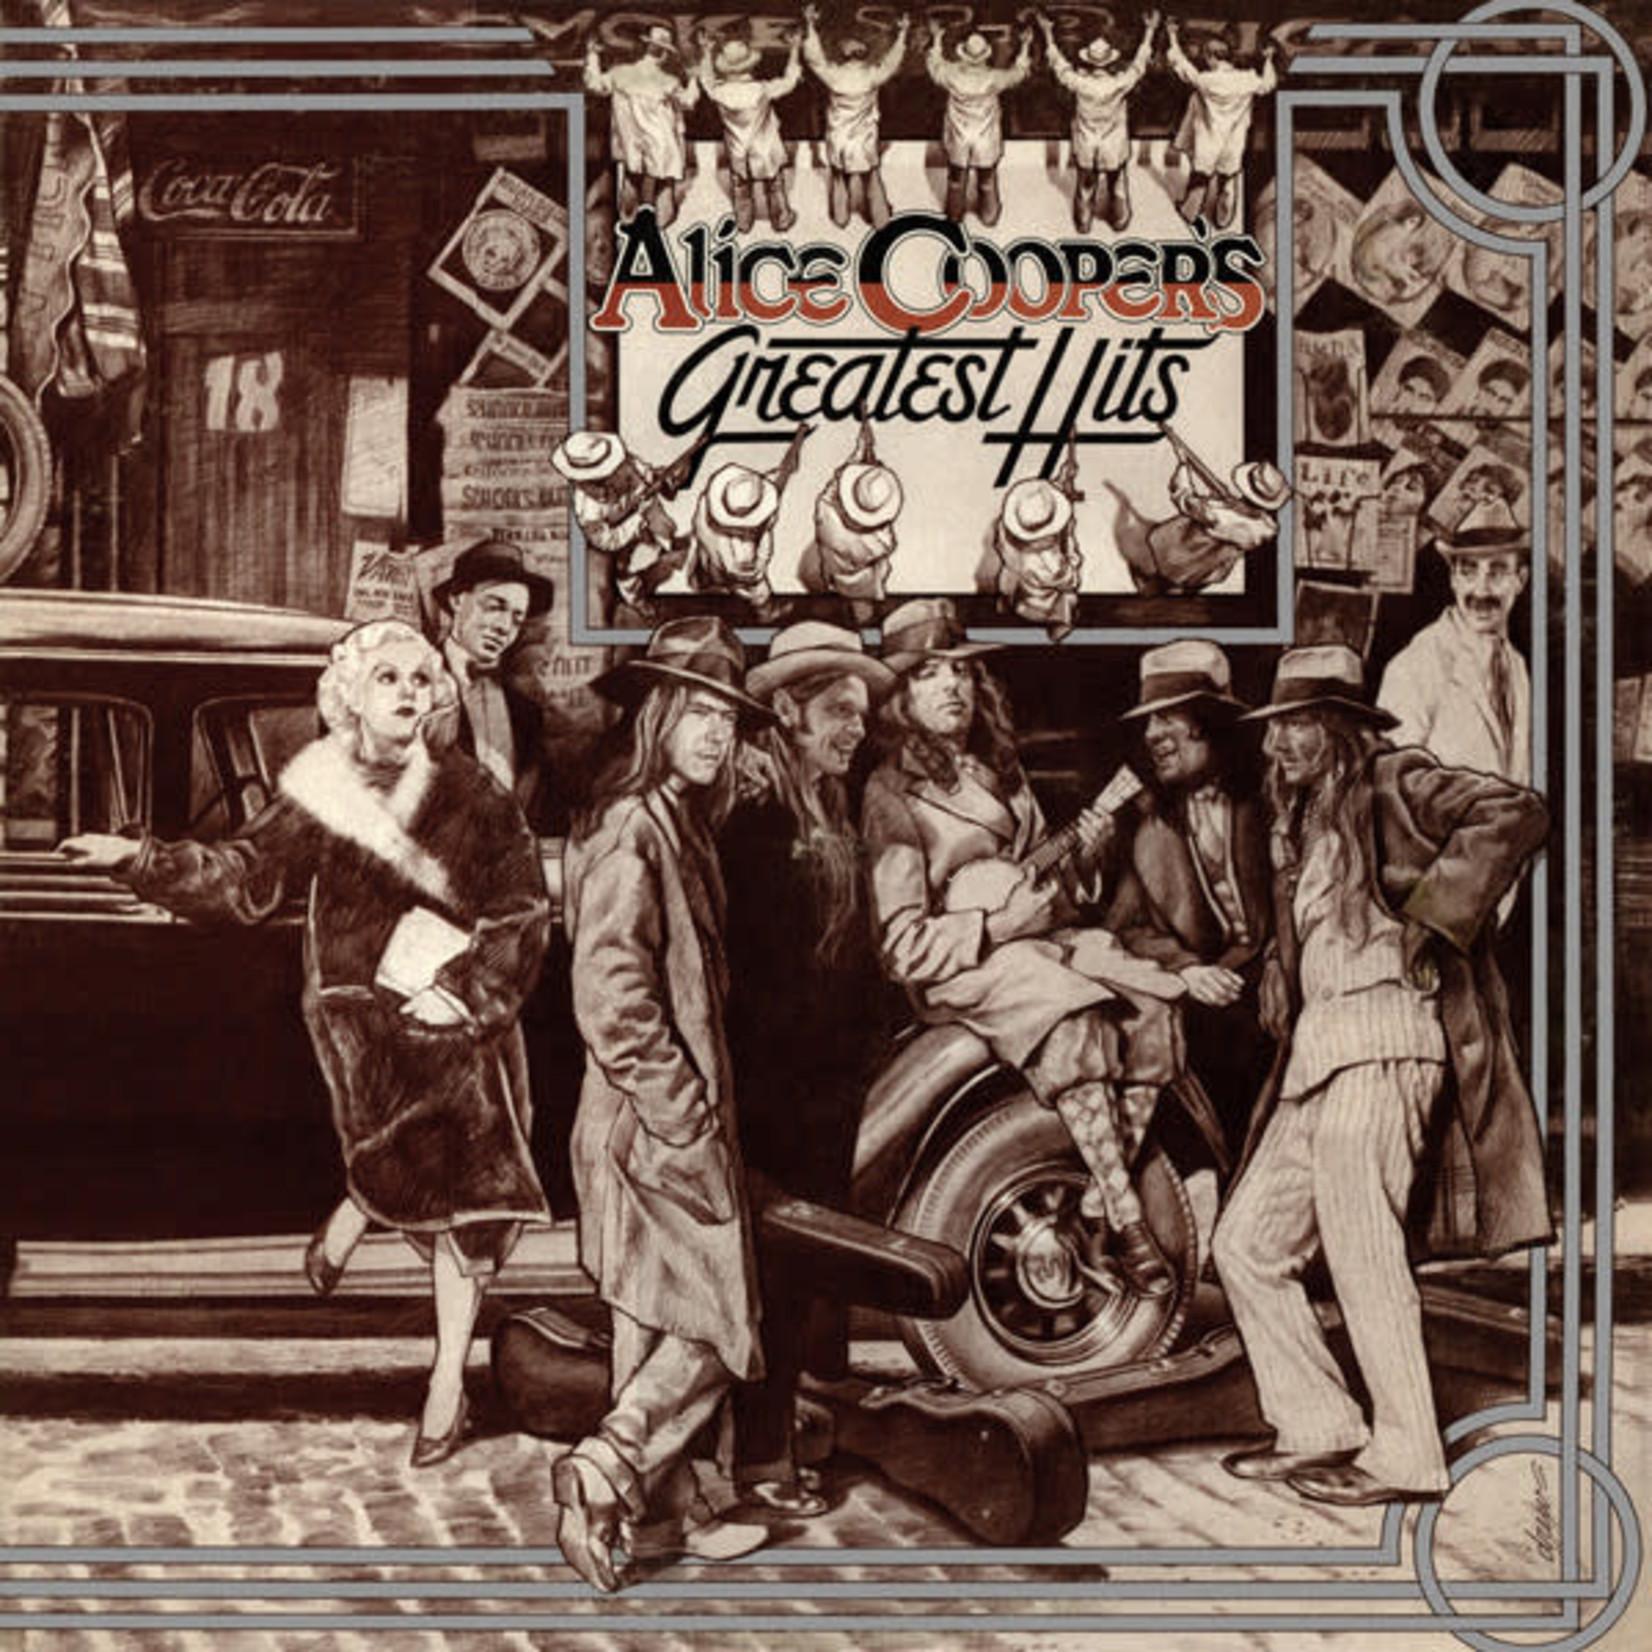 [Vintage] Cooper, Alice: Greatest Hits